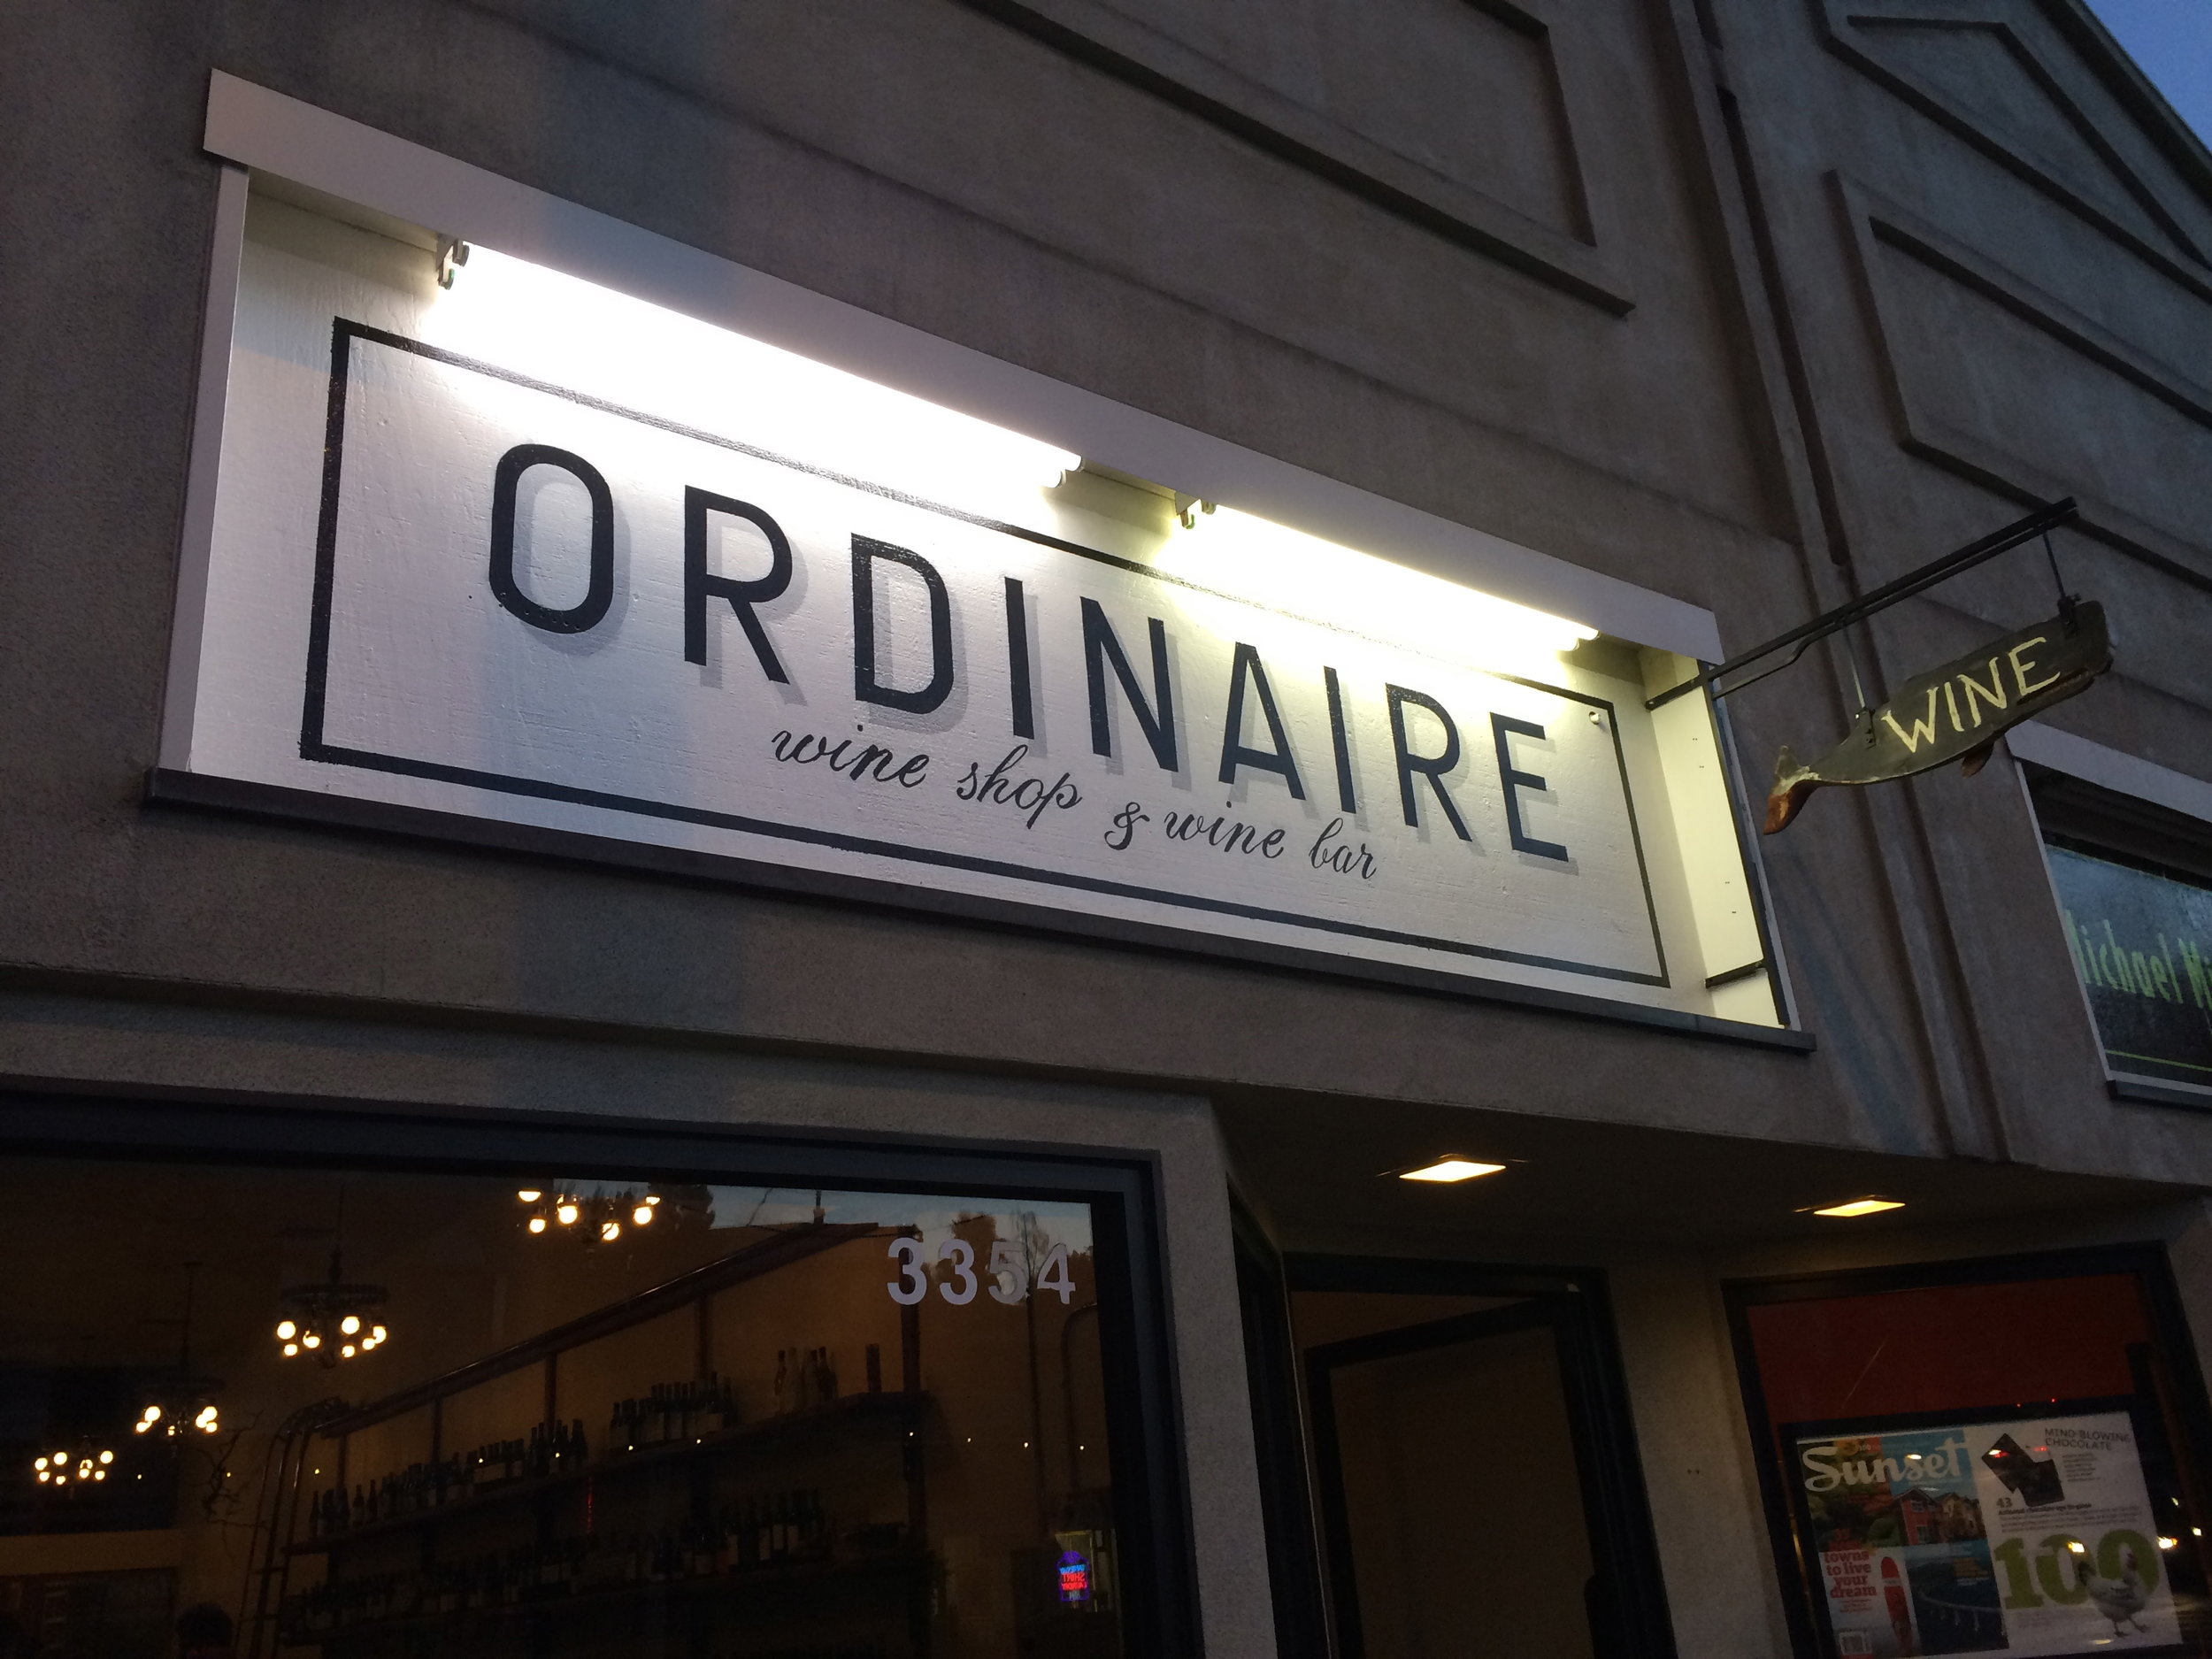 Ordinaire -- Wine shop extraodinaire